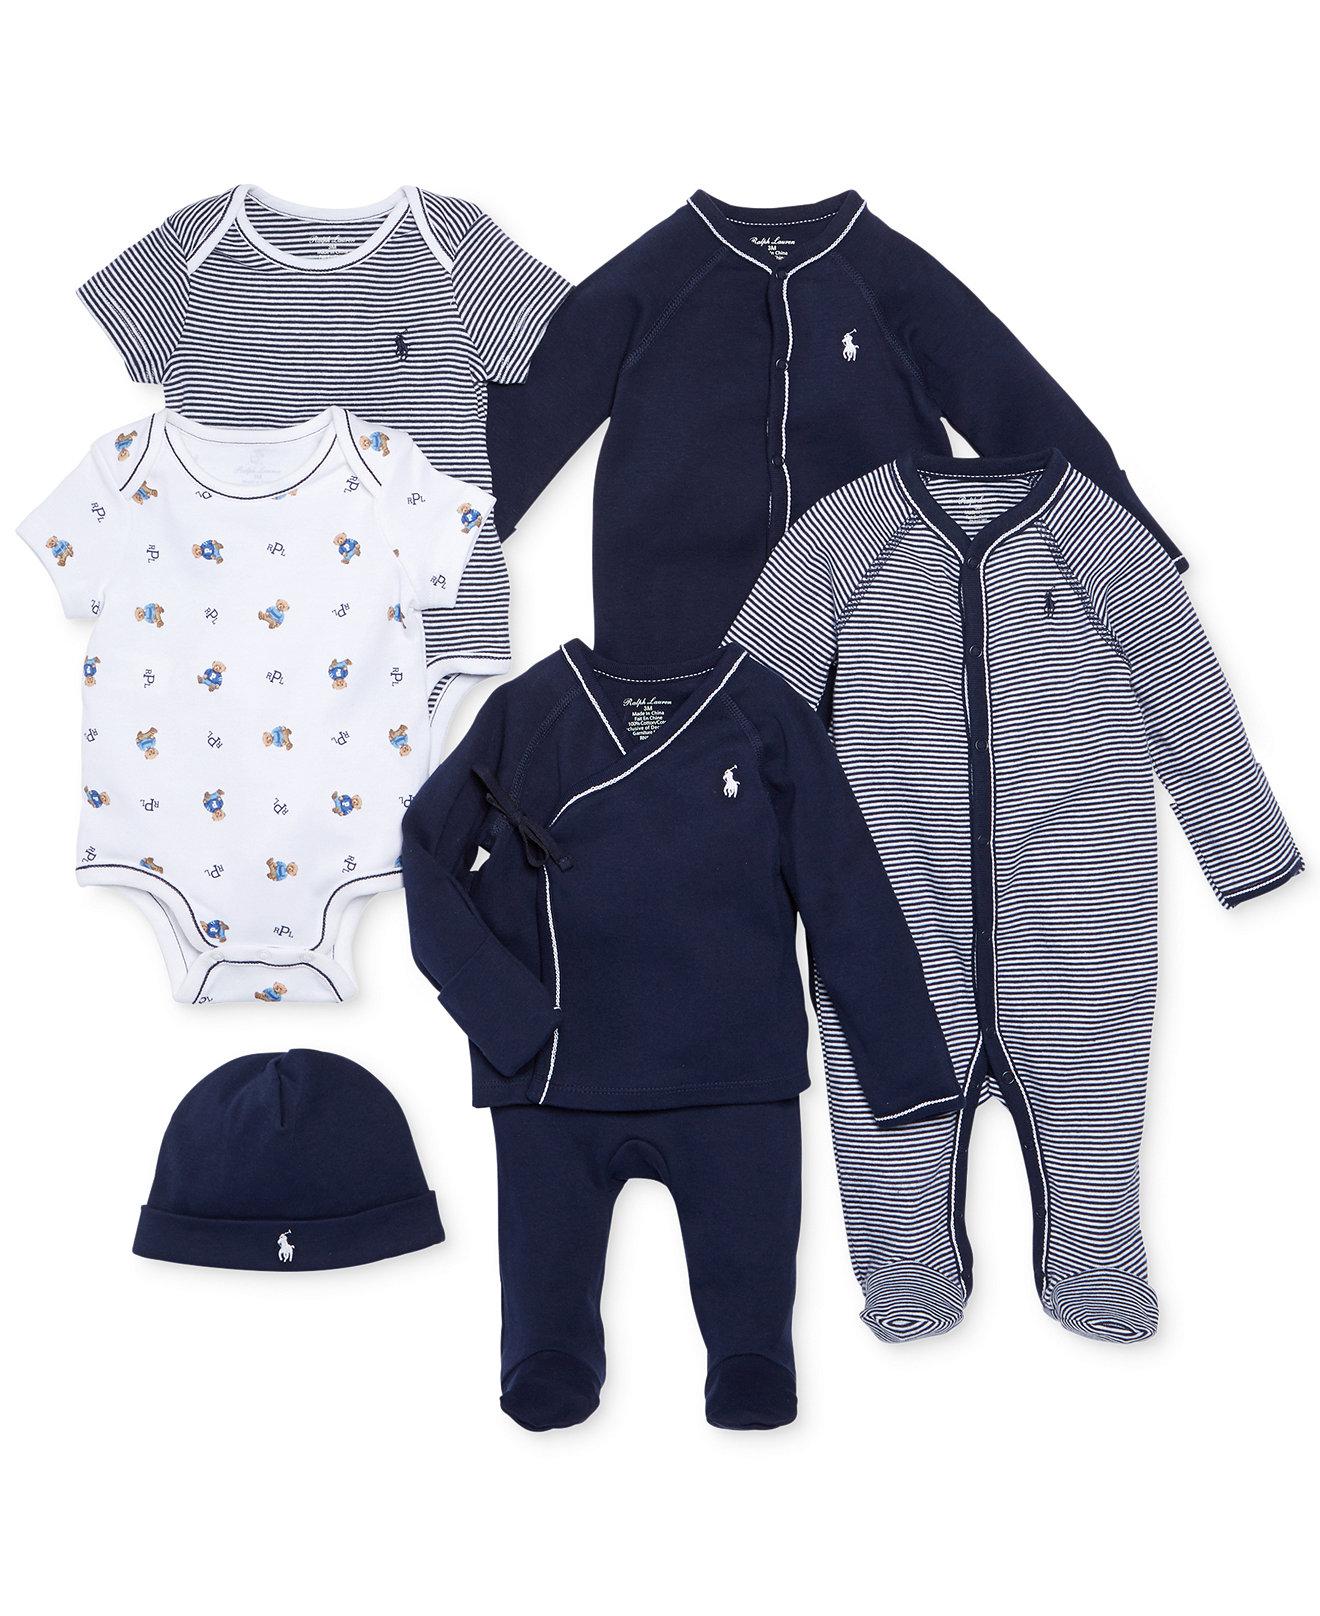 Polo Cweqbordex Kids Ralph Lauren Macy's 3uJFcTlK1